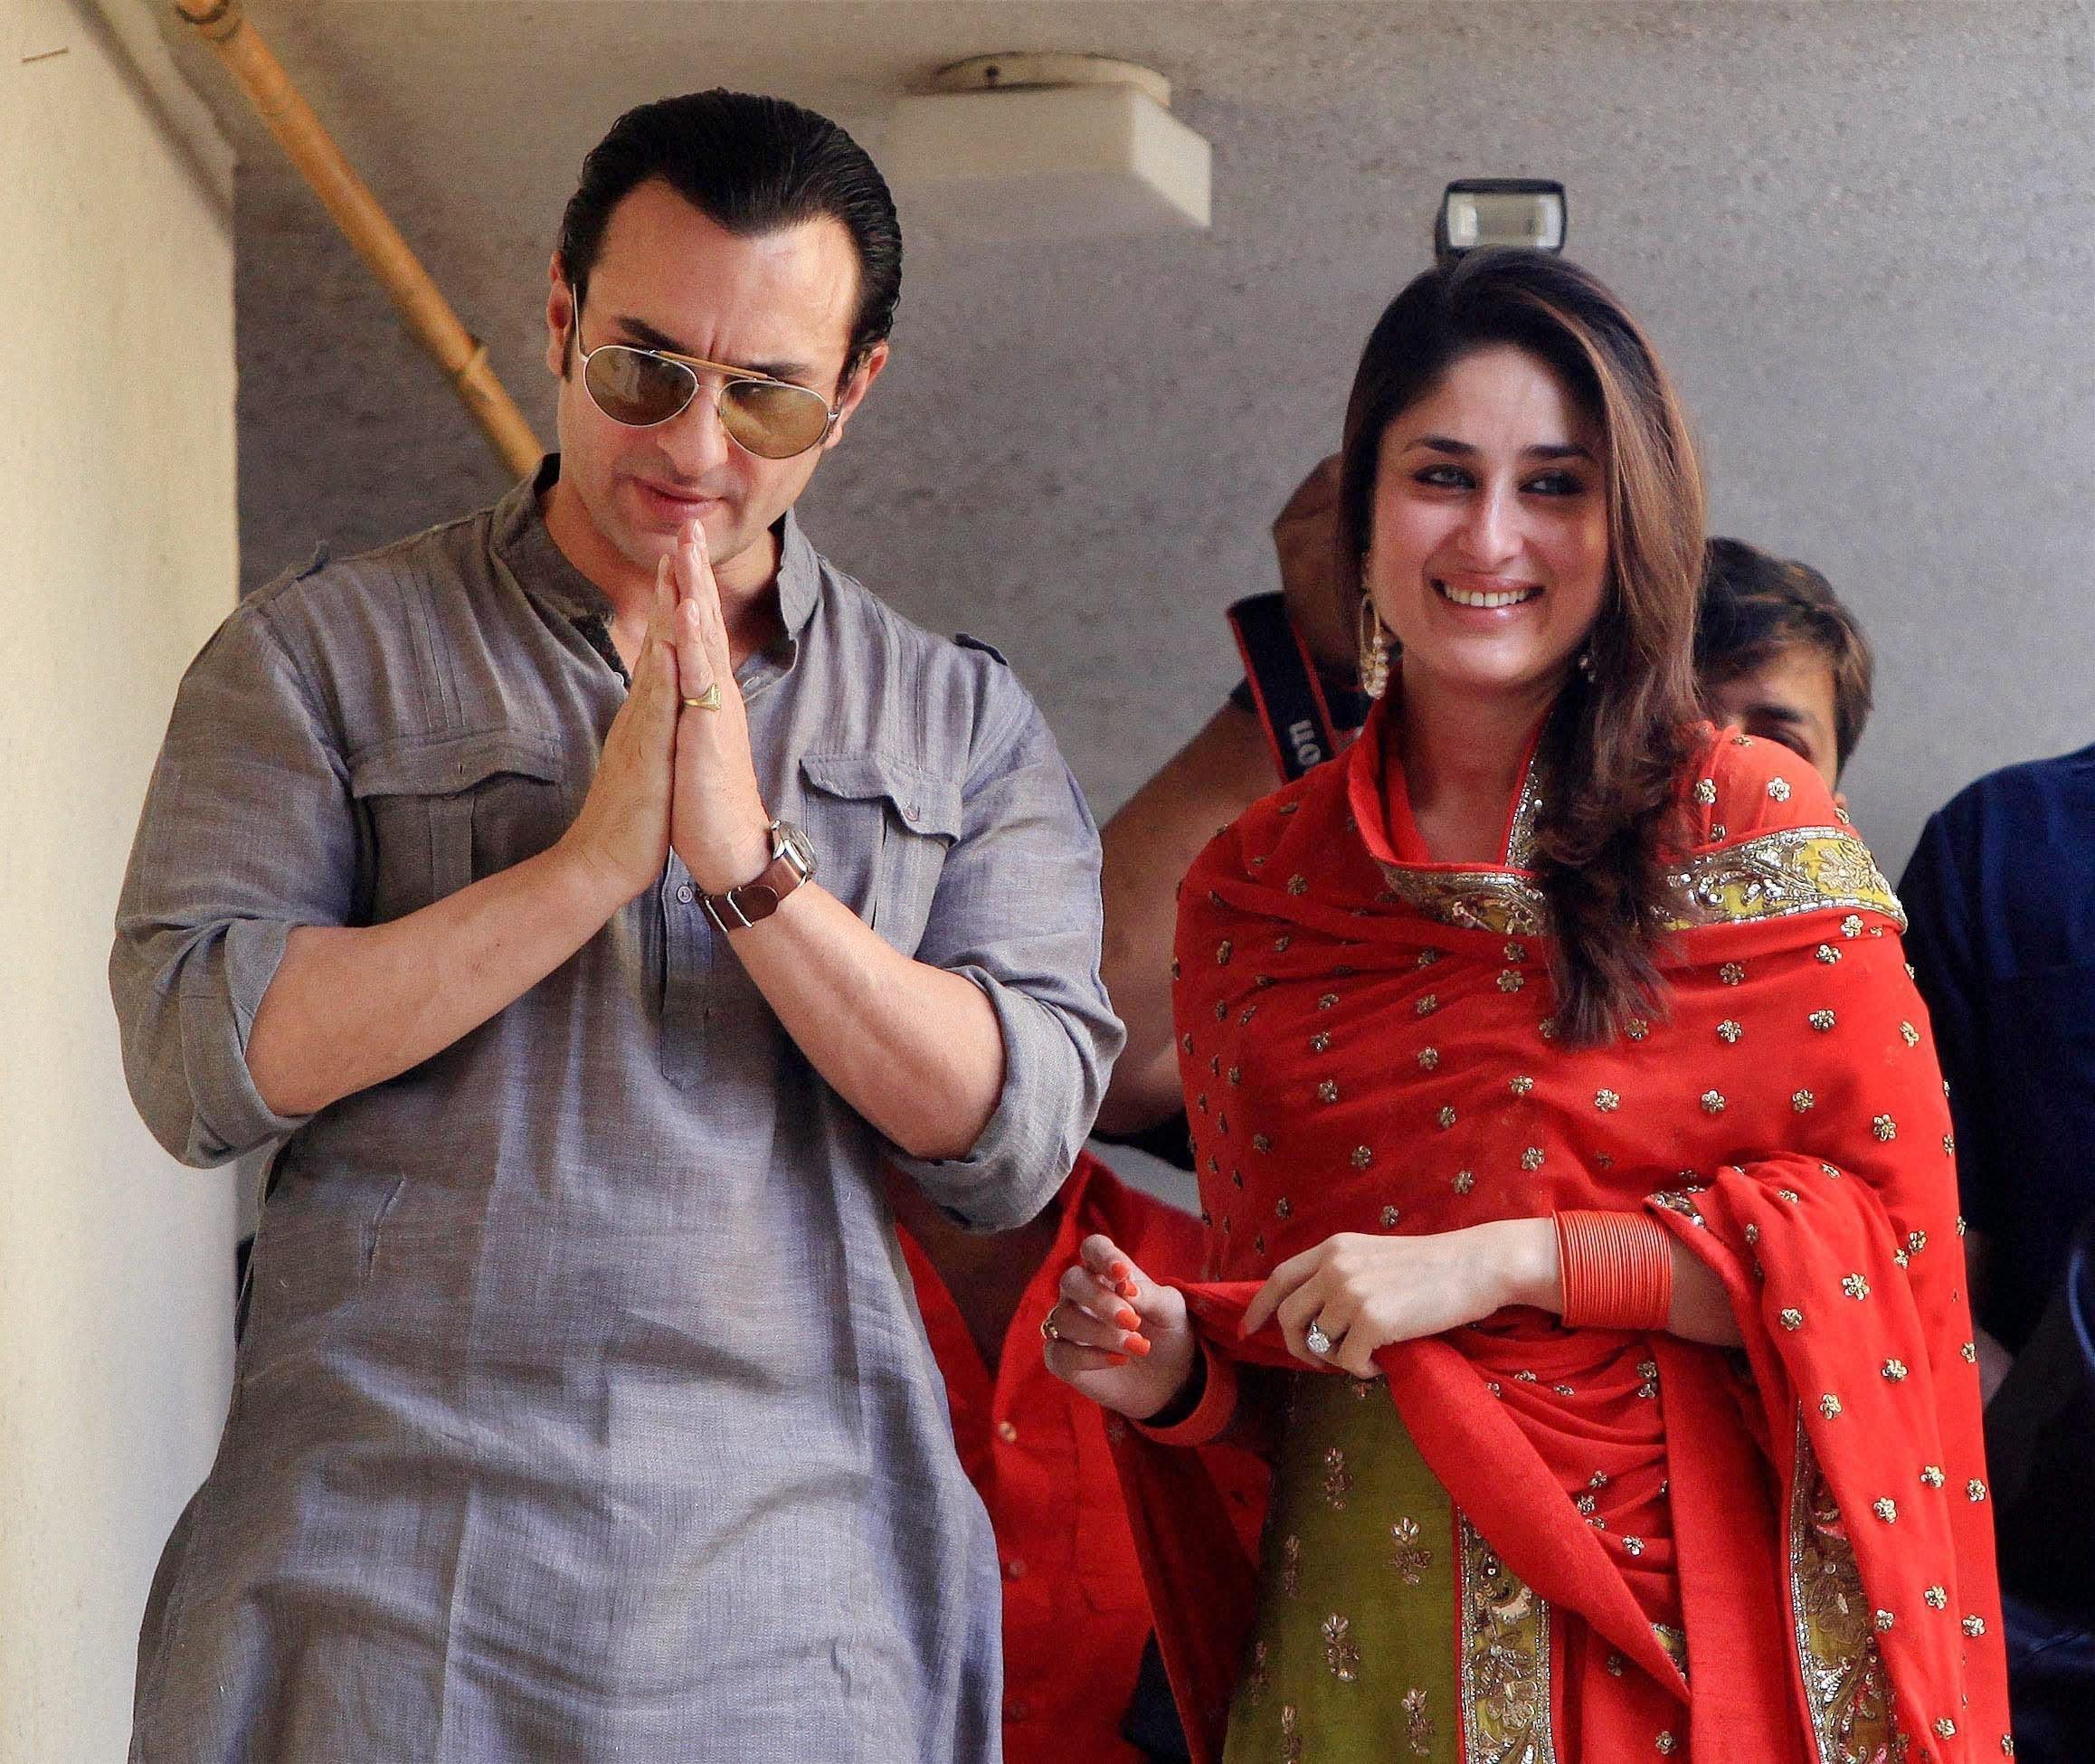 Saif Ali Khan - Kareena Kapoor Marriage is Anti-Islamic - Darul Uloom